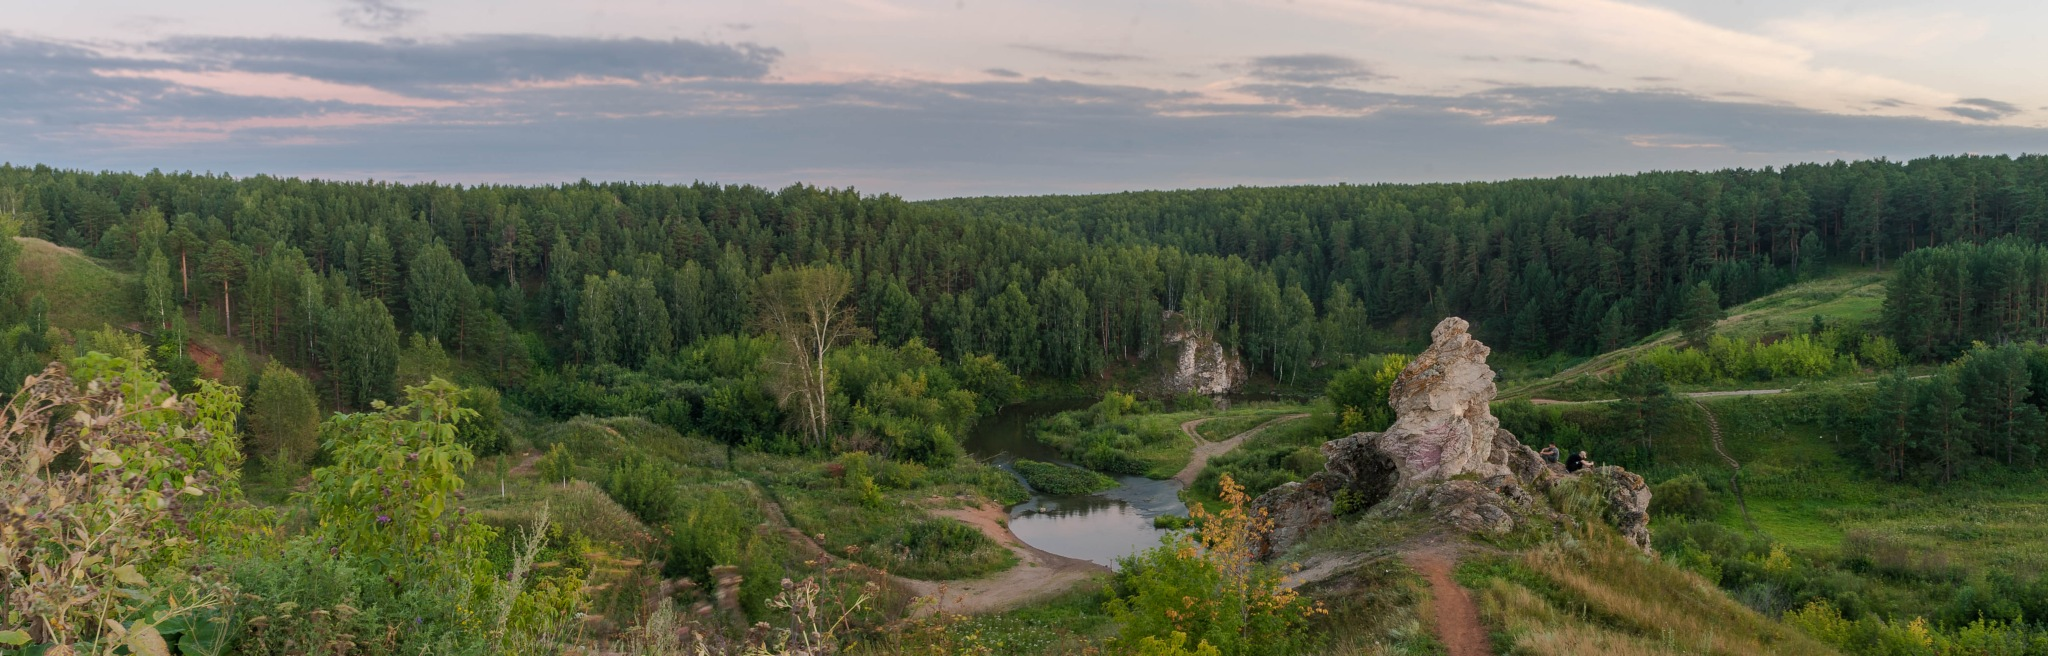 A view from above by Dmitriy Kostousov